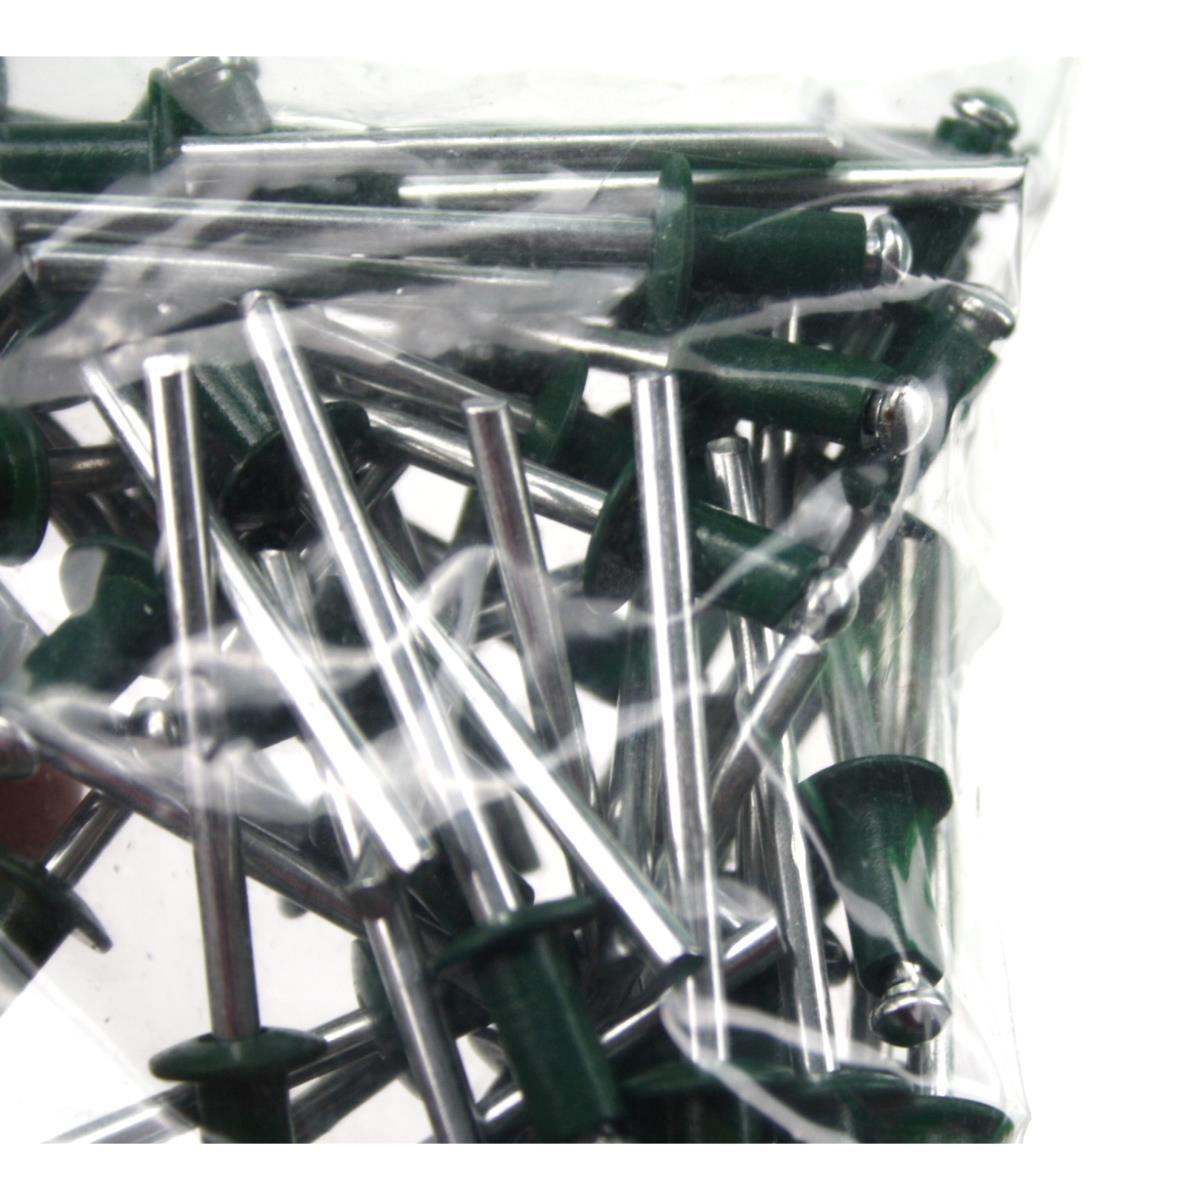 100 Stück Blindnieten 4,0 x 6mm dunkelbraun Popnieten Alu//Stahl Flachkopf Nieten